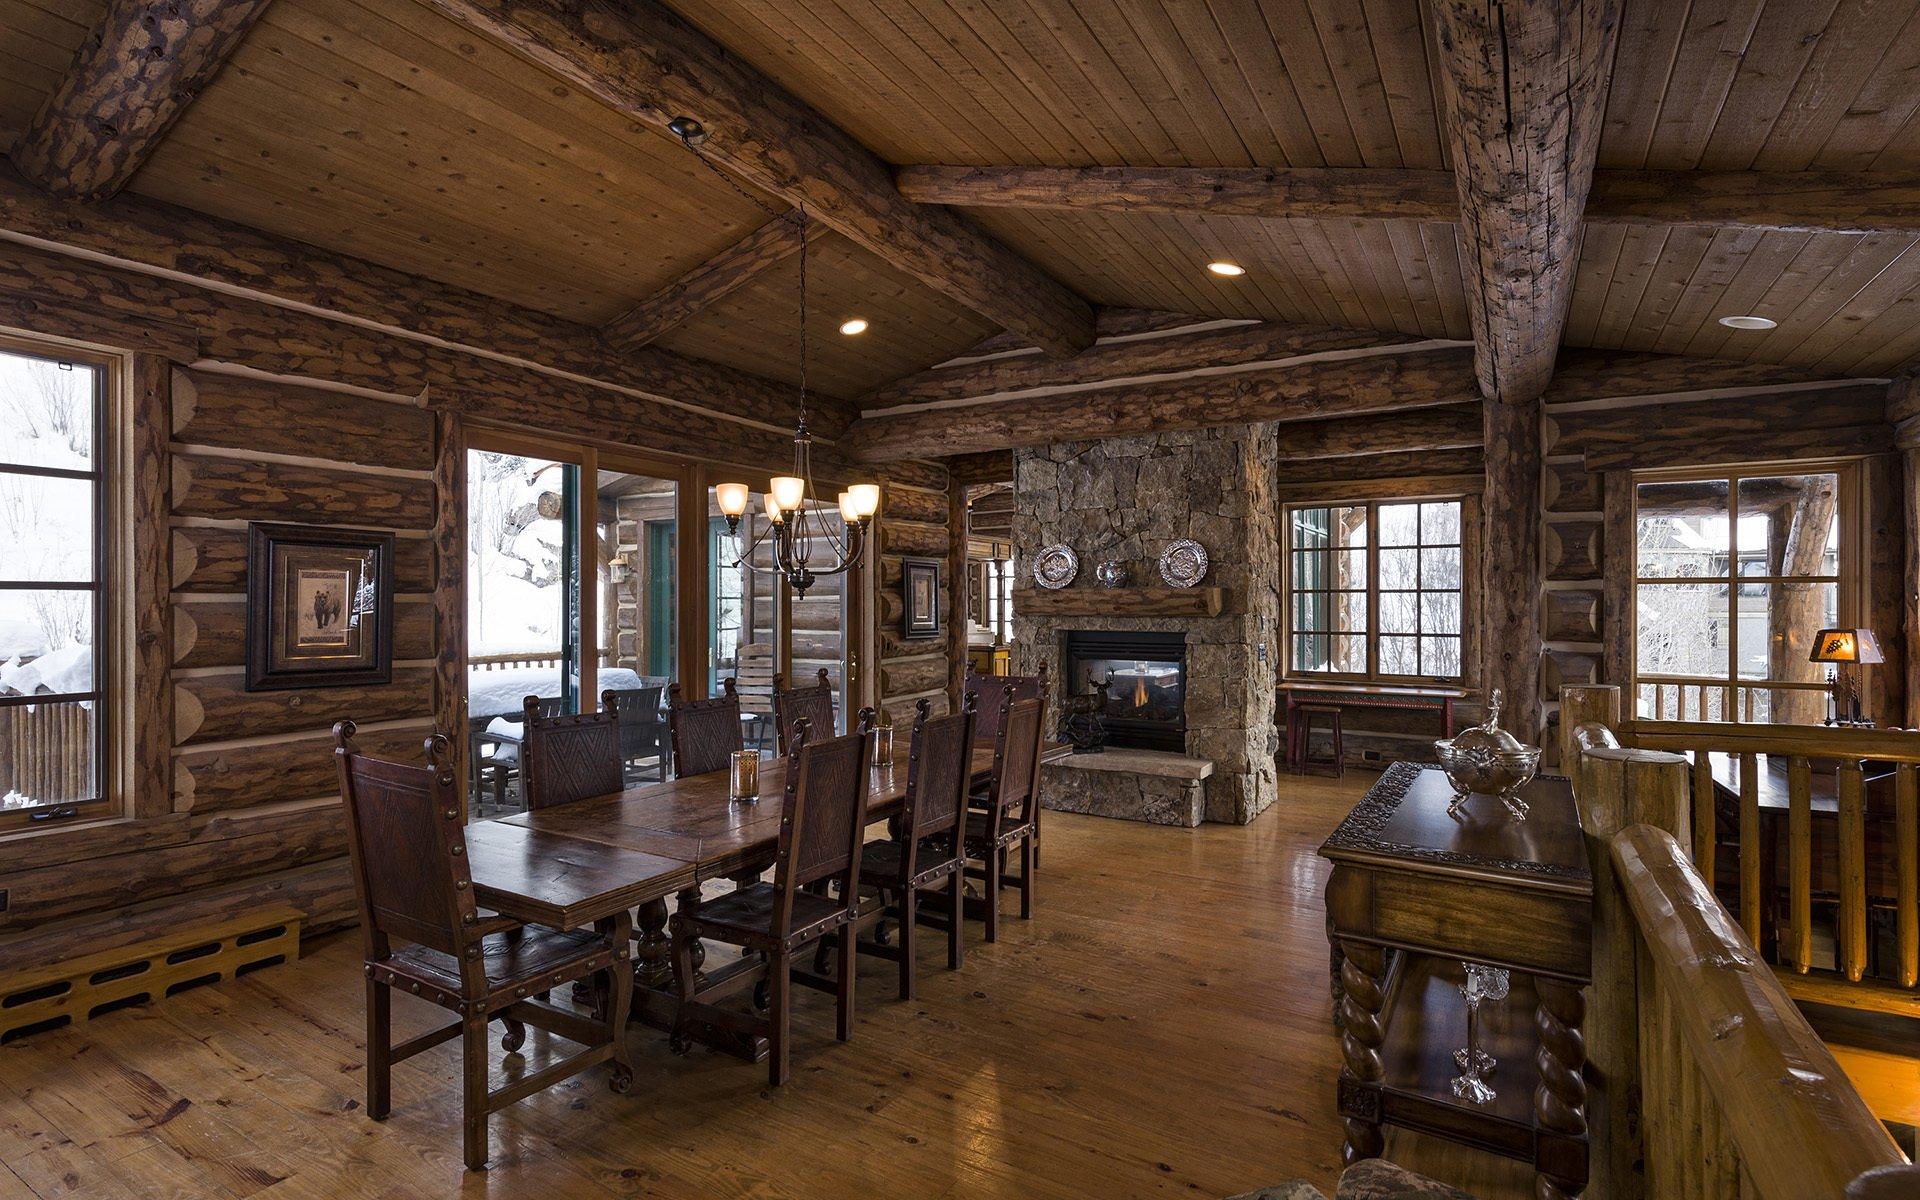 Blue sky lodge dinner room luxury home wooden log hd обои дл.